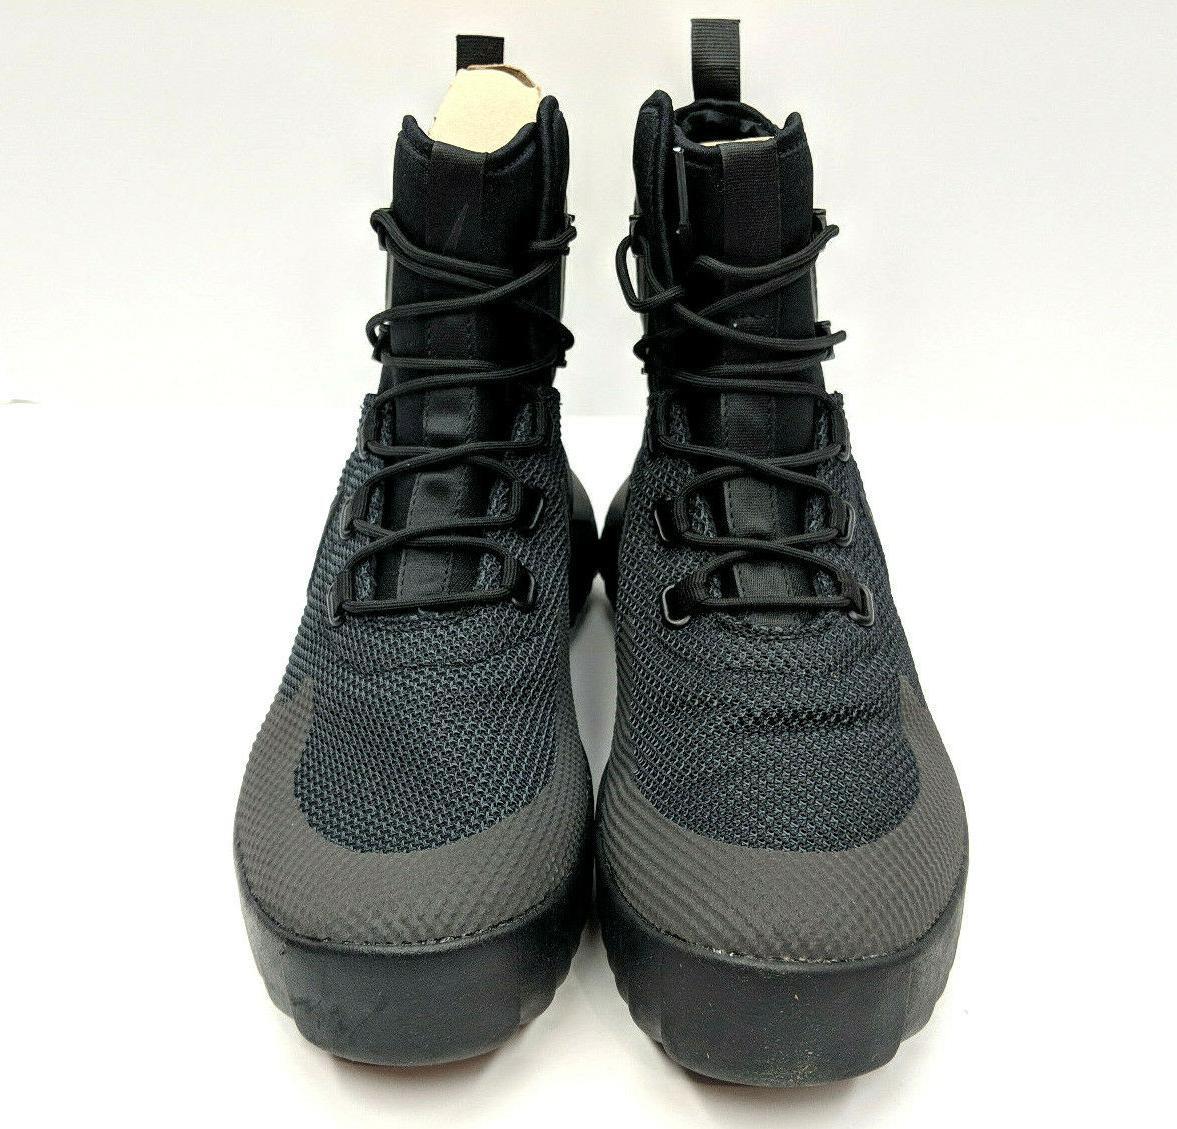 Nike Air Wild Mid Mens Triple Black Boots Trail Hiking 916819-001 NIB